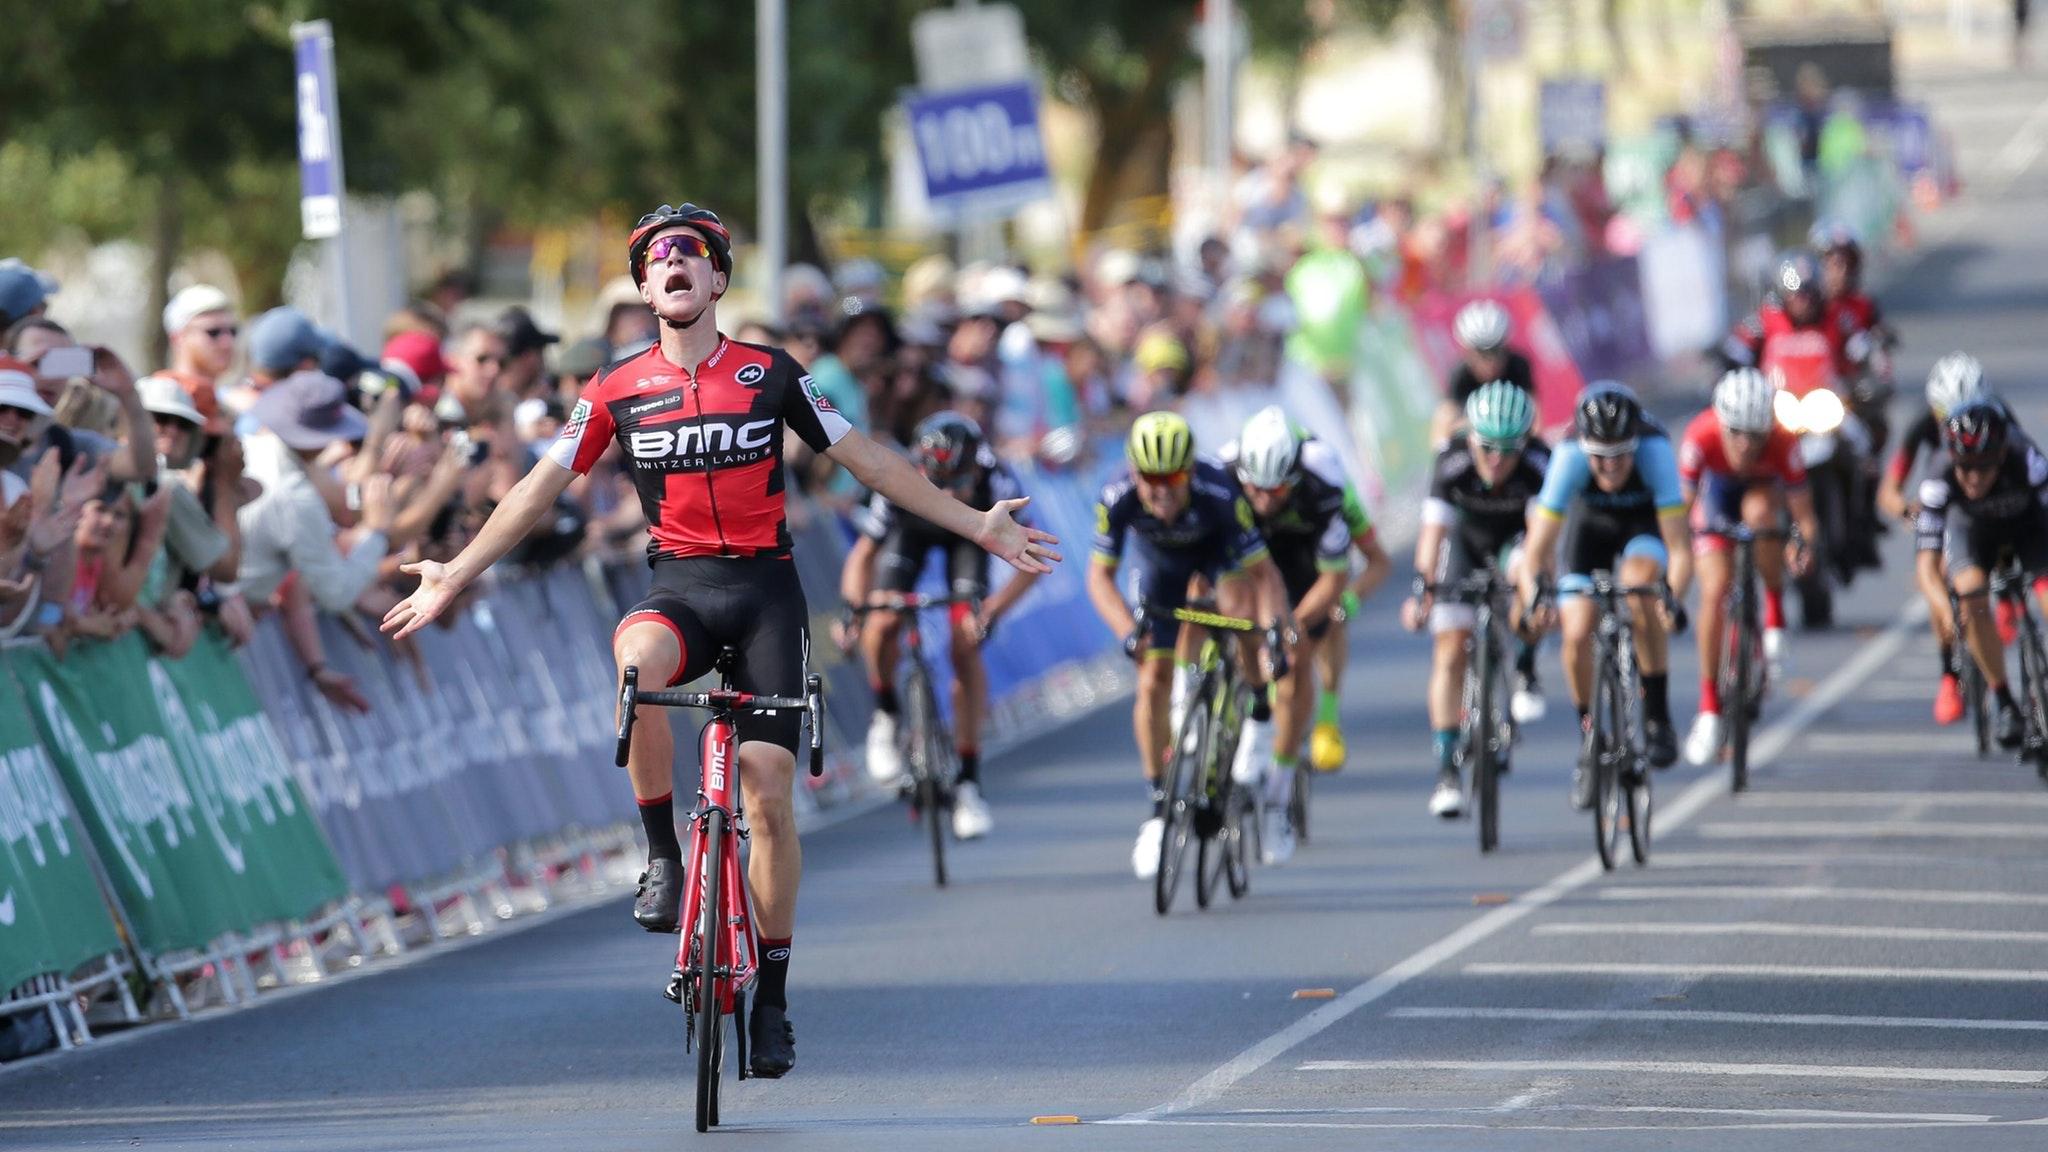 Miles Scoton BMC Celebrates his national title win